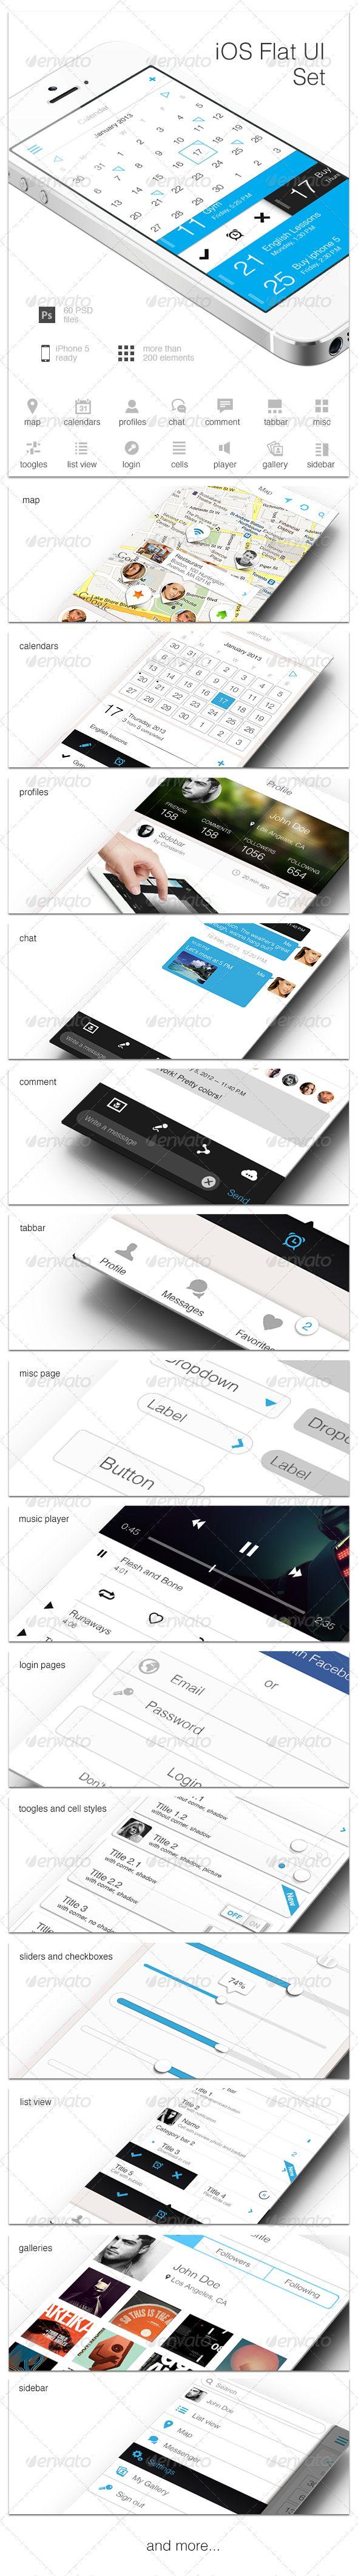 iOS Flat UI Set